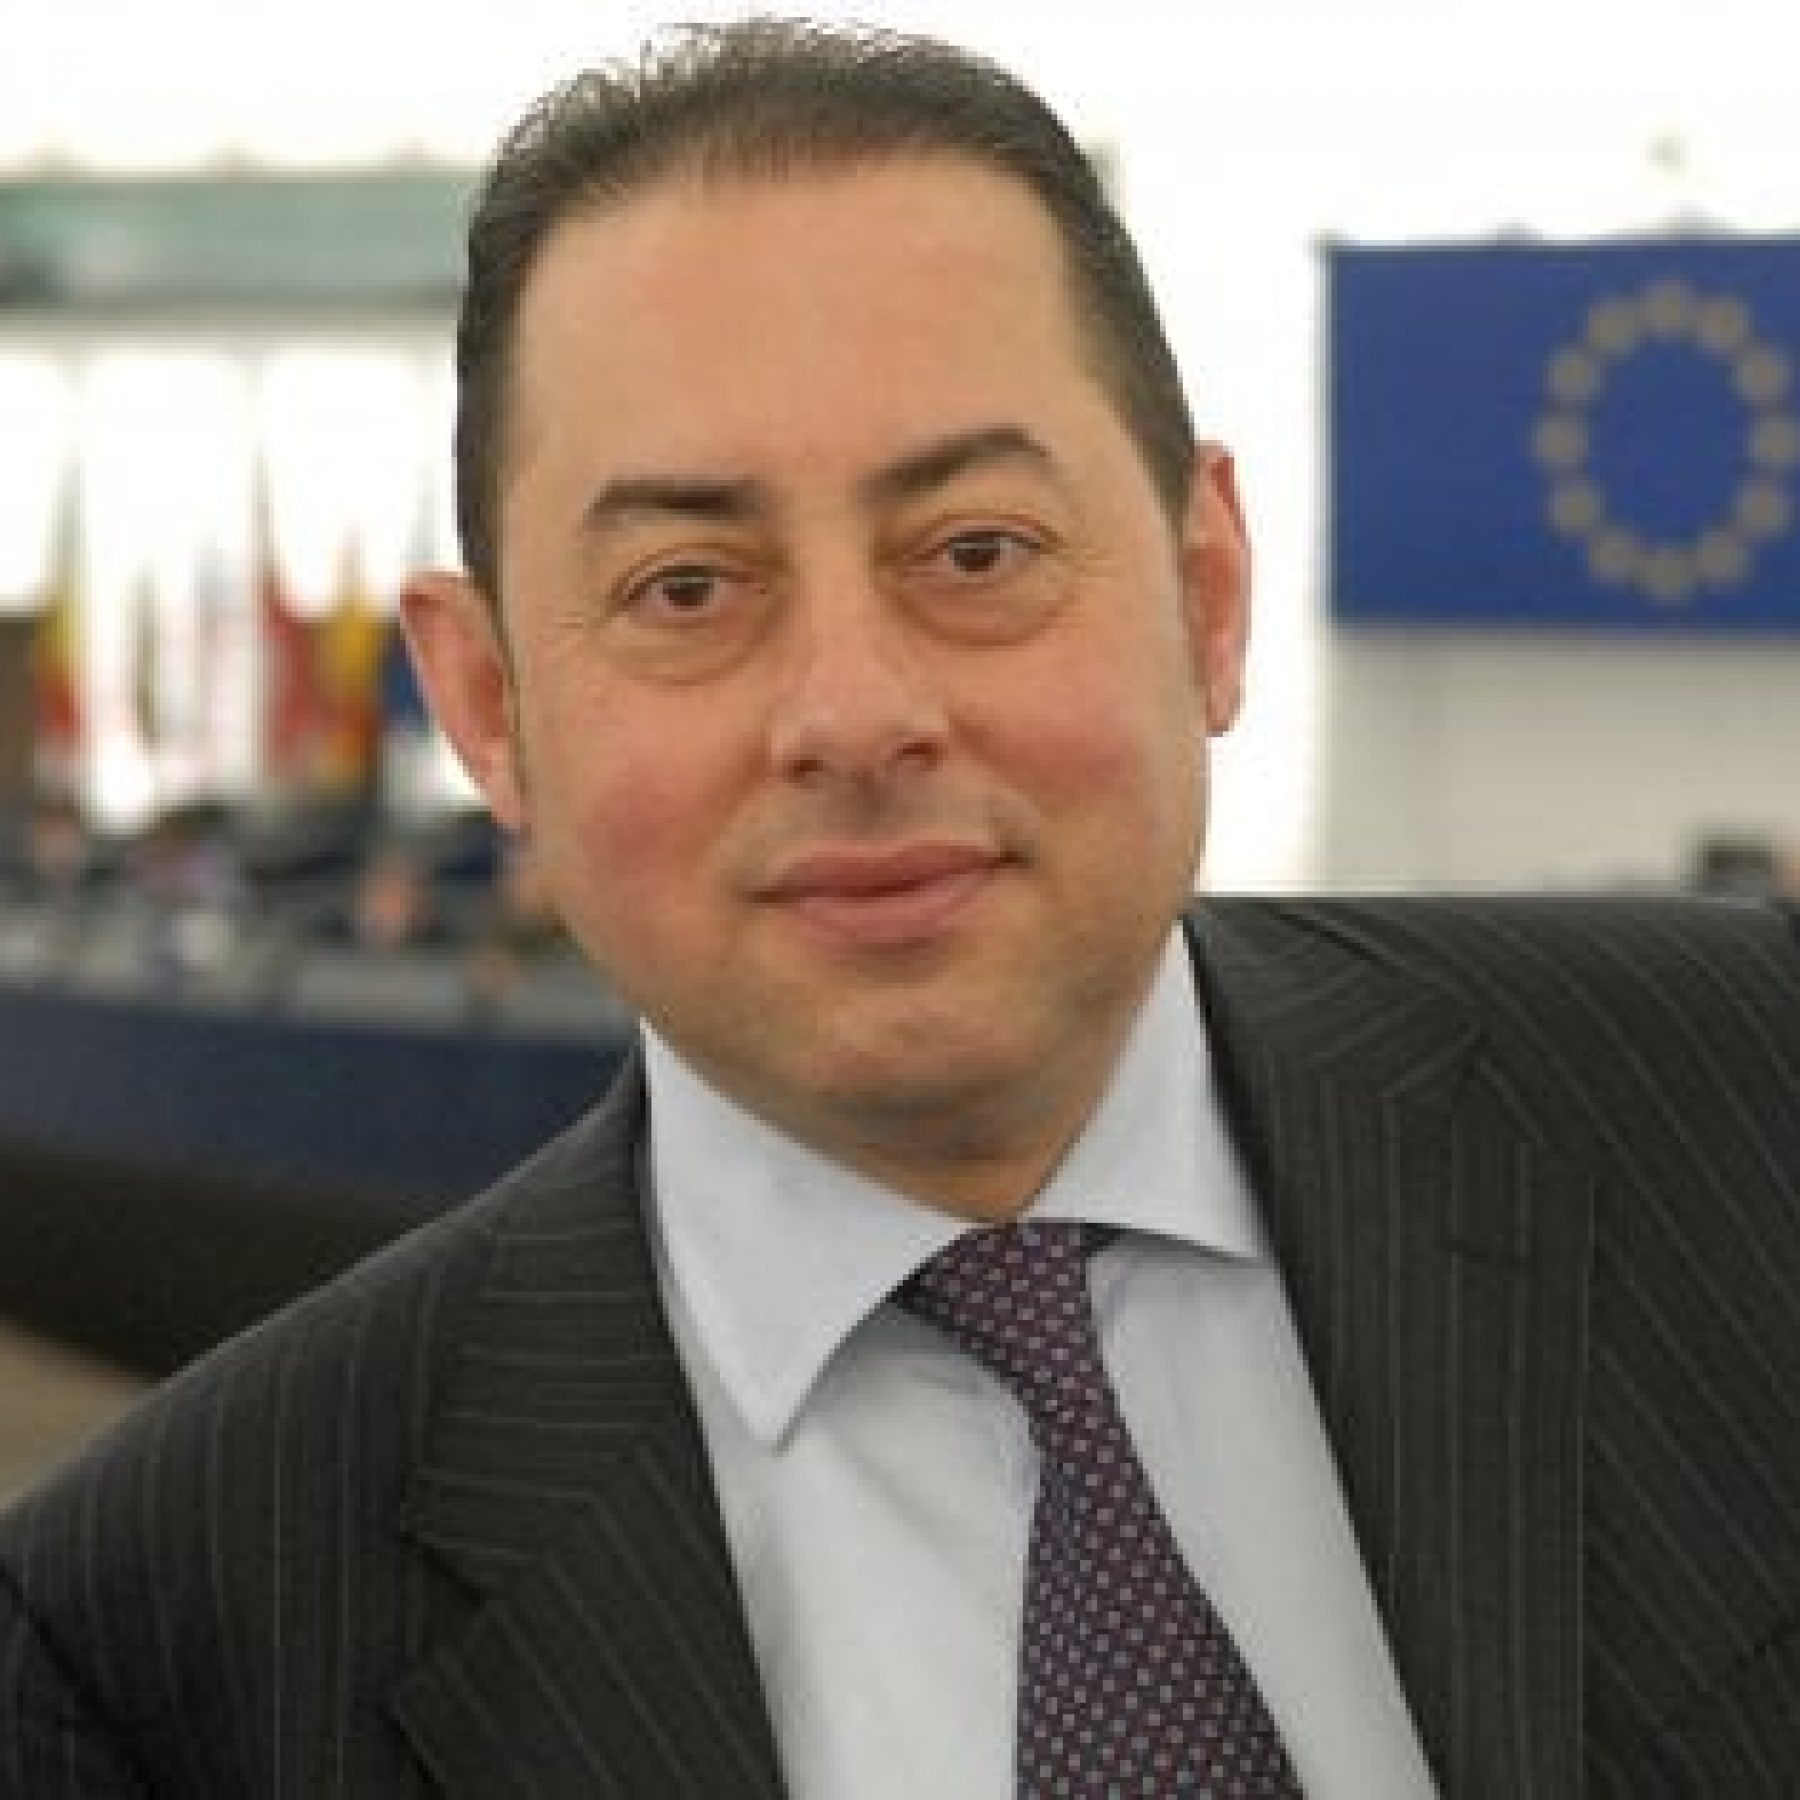 Pittella